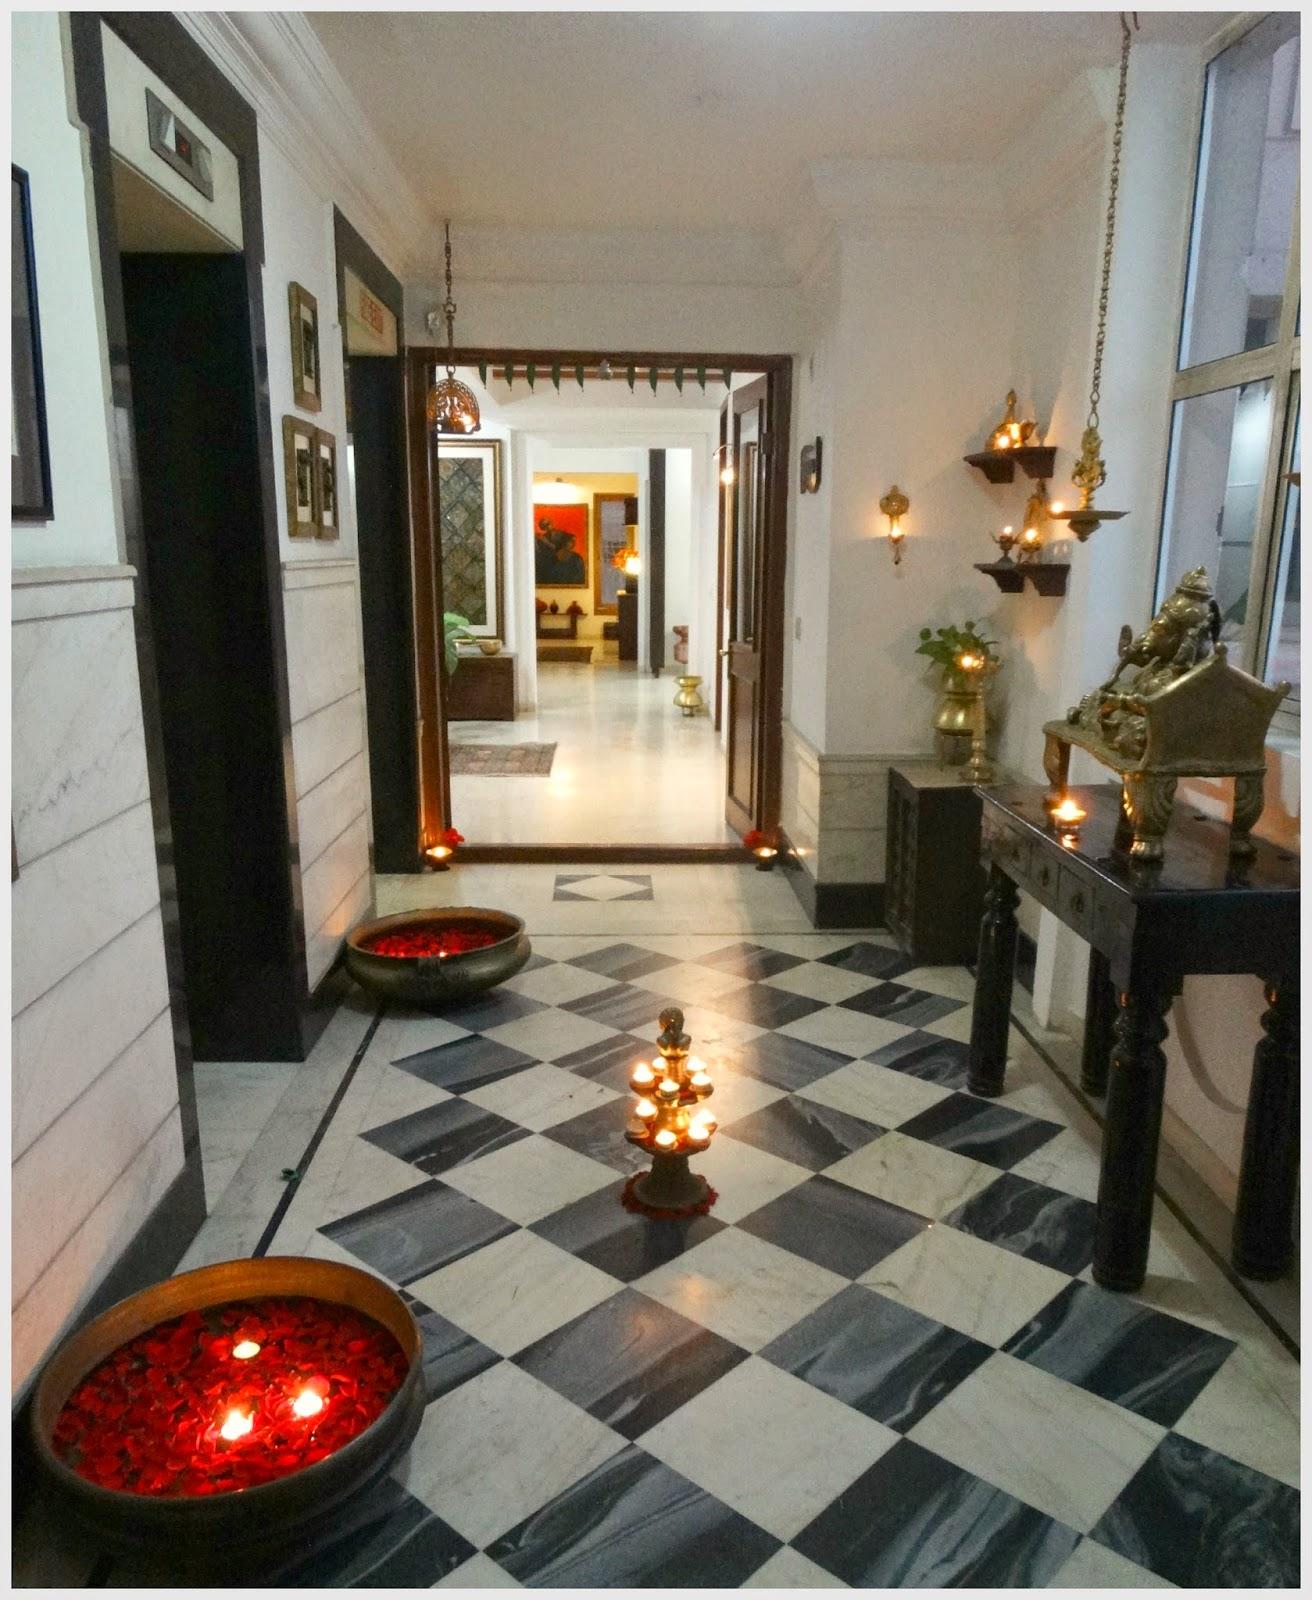 50 Indian Interior Design Ideas: The East Coast Desi: Sophisticated Simplicity